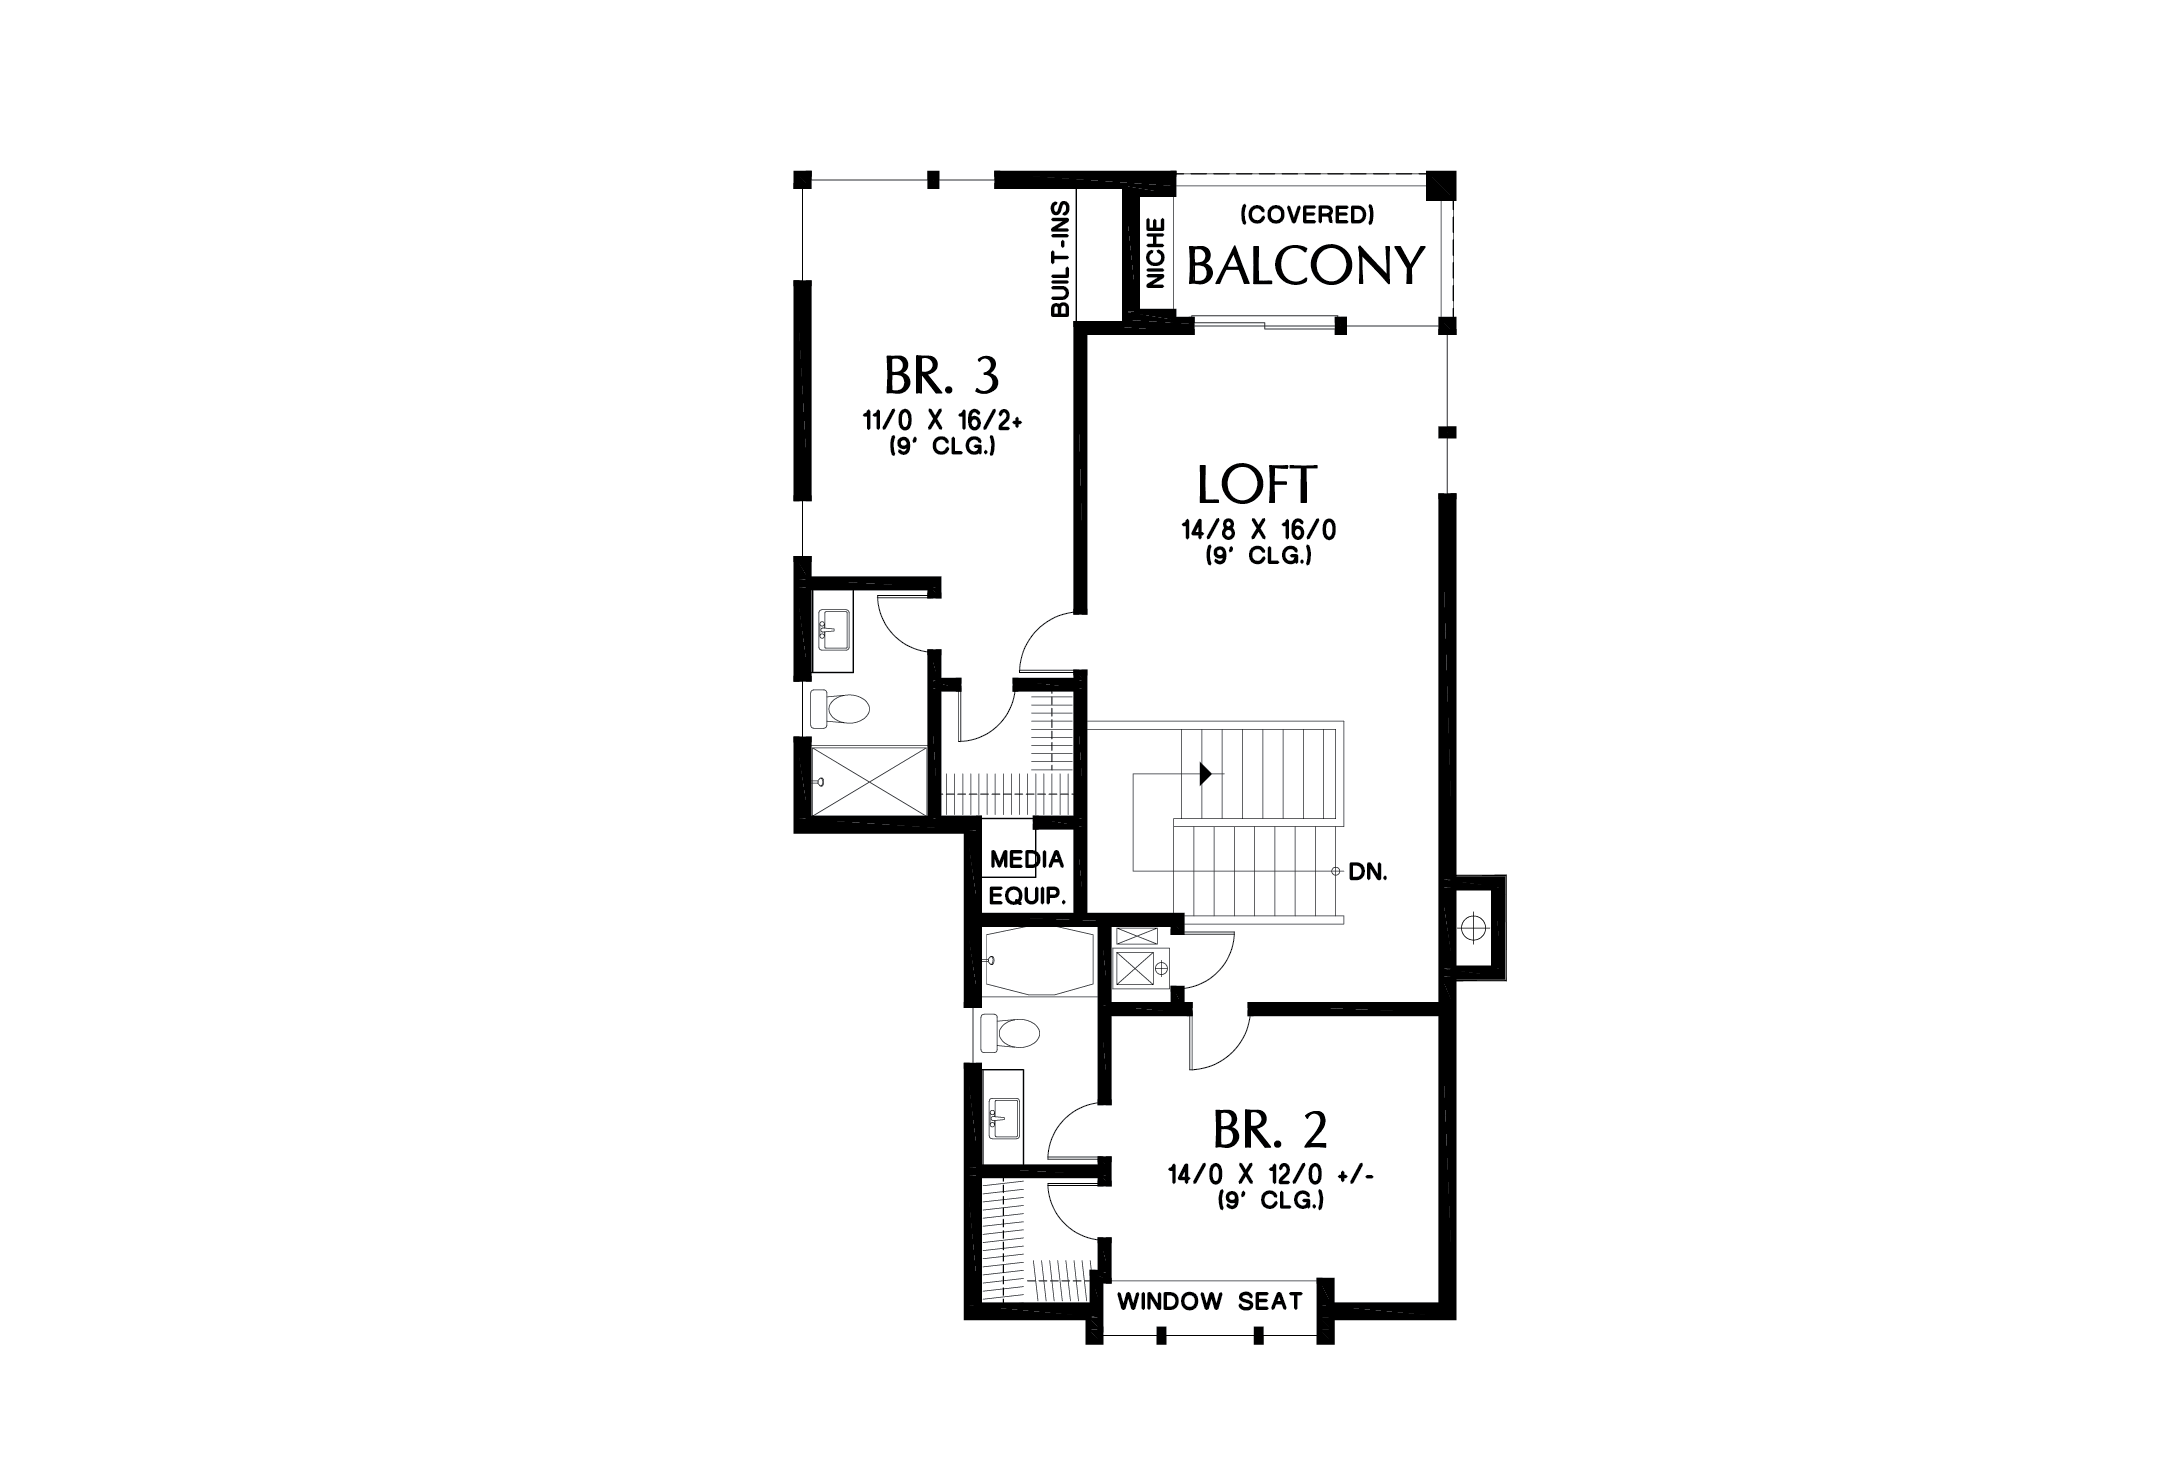 Contemporary Style House Plan - 4 Beds 4 Baths 2900 Sq/Ft Plan #48-1004 Floor Plan - Upper Floor Plan